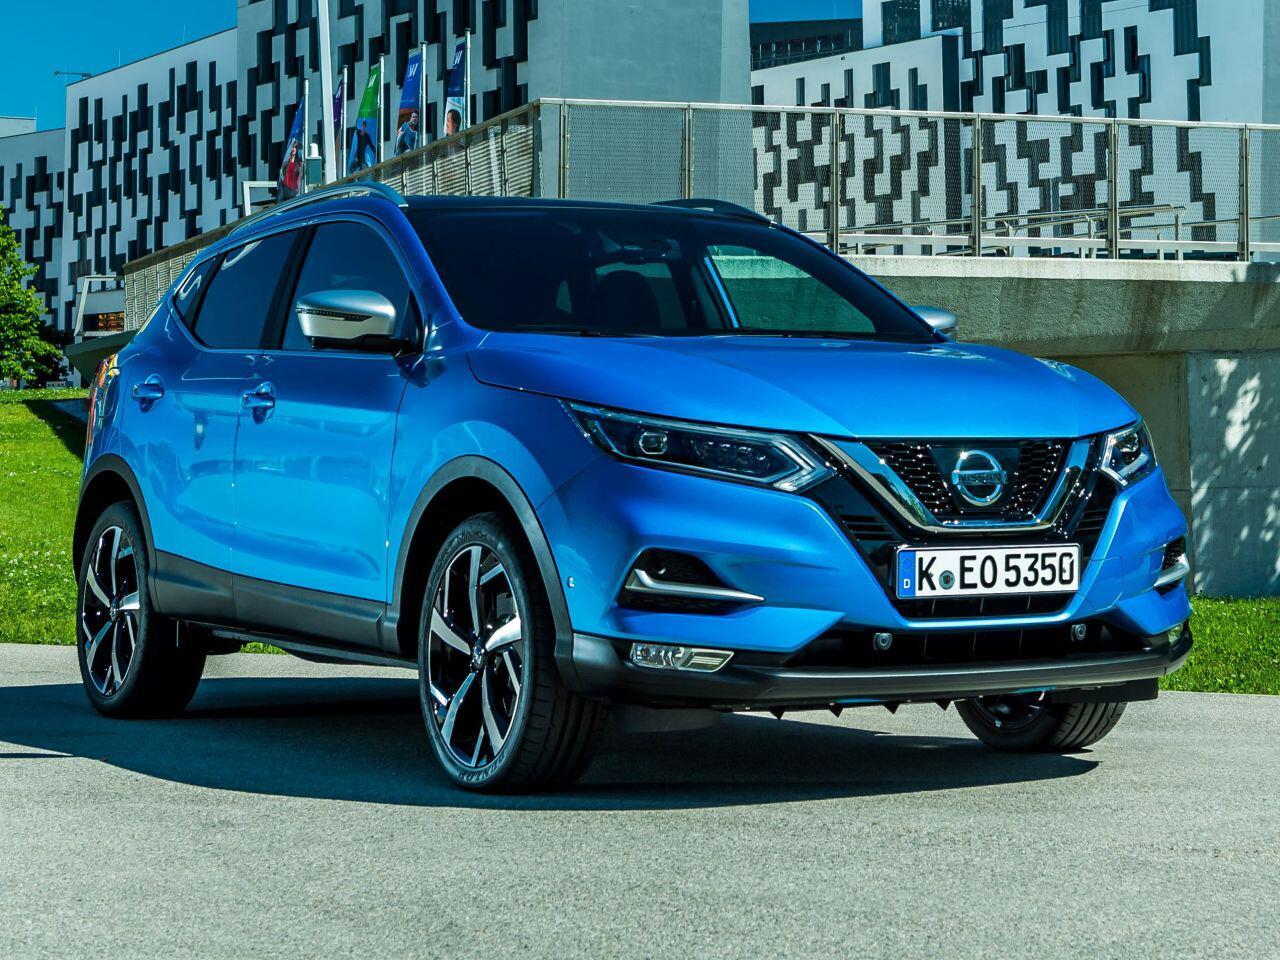 Bild zu Platz 12: Nissan Qashqai